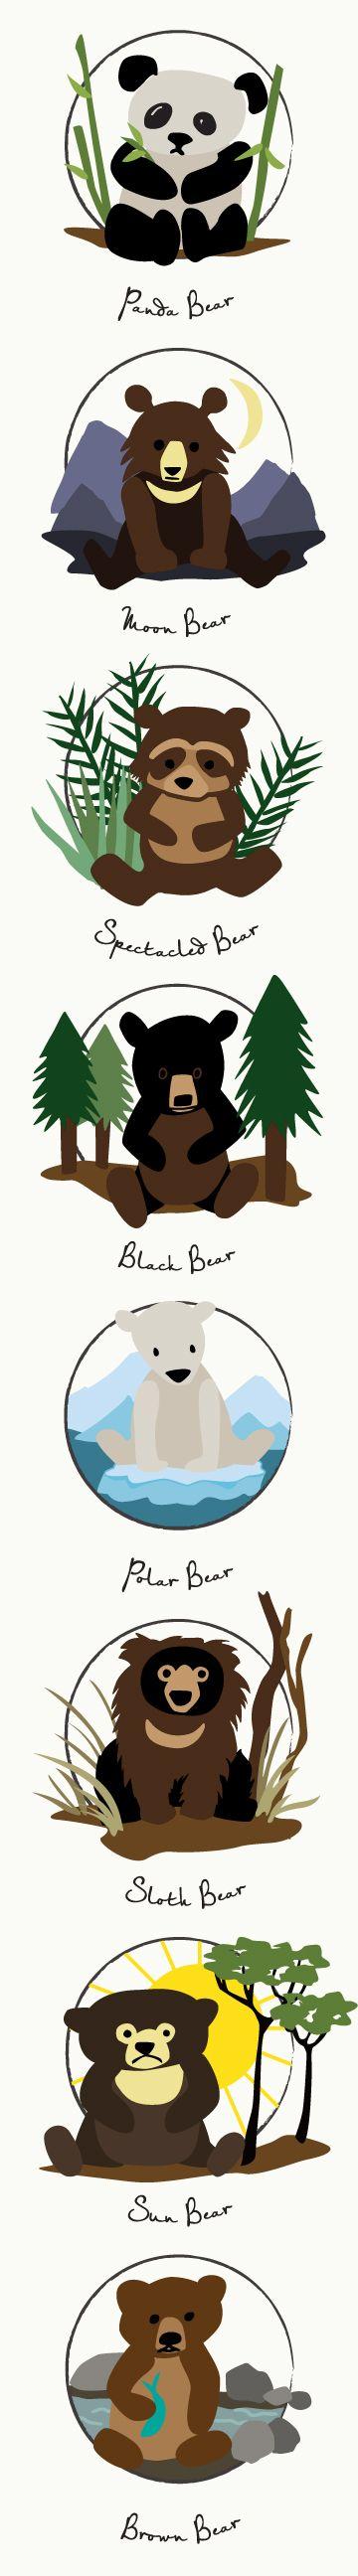 Ursidae Poster featuring all 8 species of bear by Daughter Earth (Panda, Moon Bear, Spectacled Bear, Black Bear, Polar Bear, Sloth Bear, Sun Bear, Brown Bear) What about Kodiak and Grizzly Bear? Both are subspecies of Brown Bear. And Koalas? They are Marsupials.